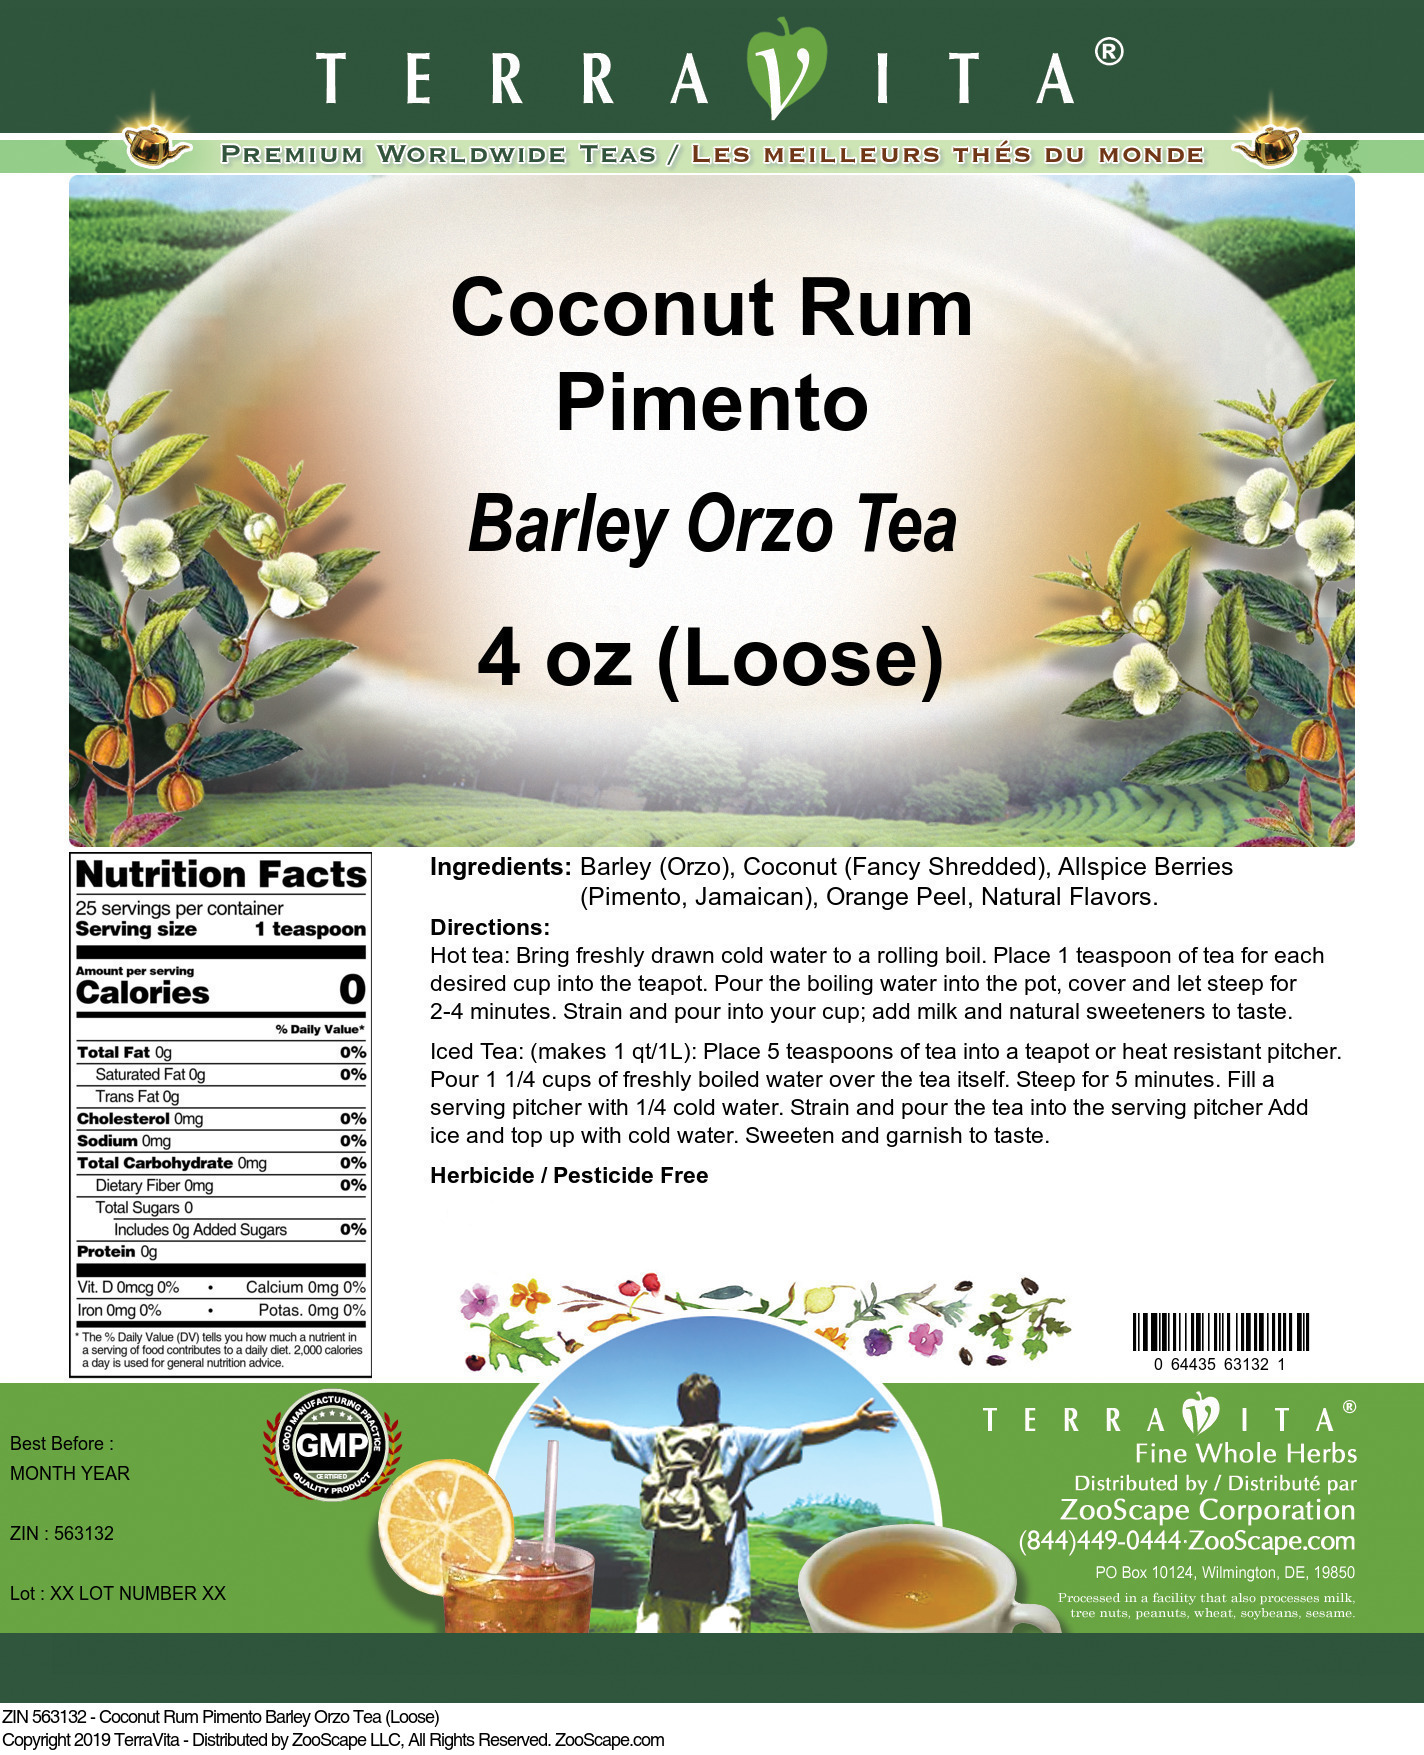 Coconut Rum Pimento Barley Orzo Tea (Loose)